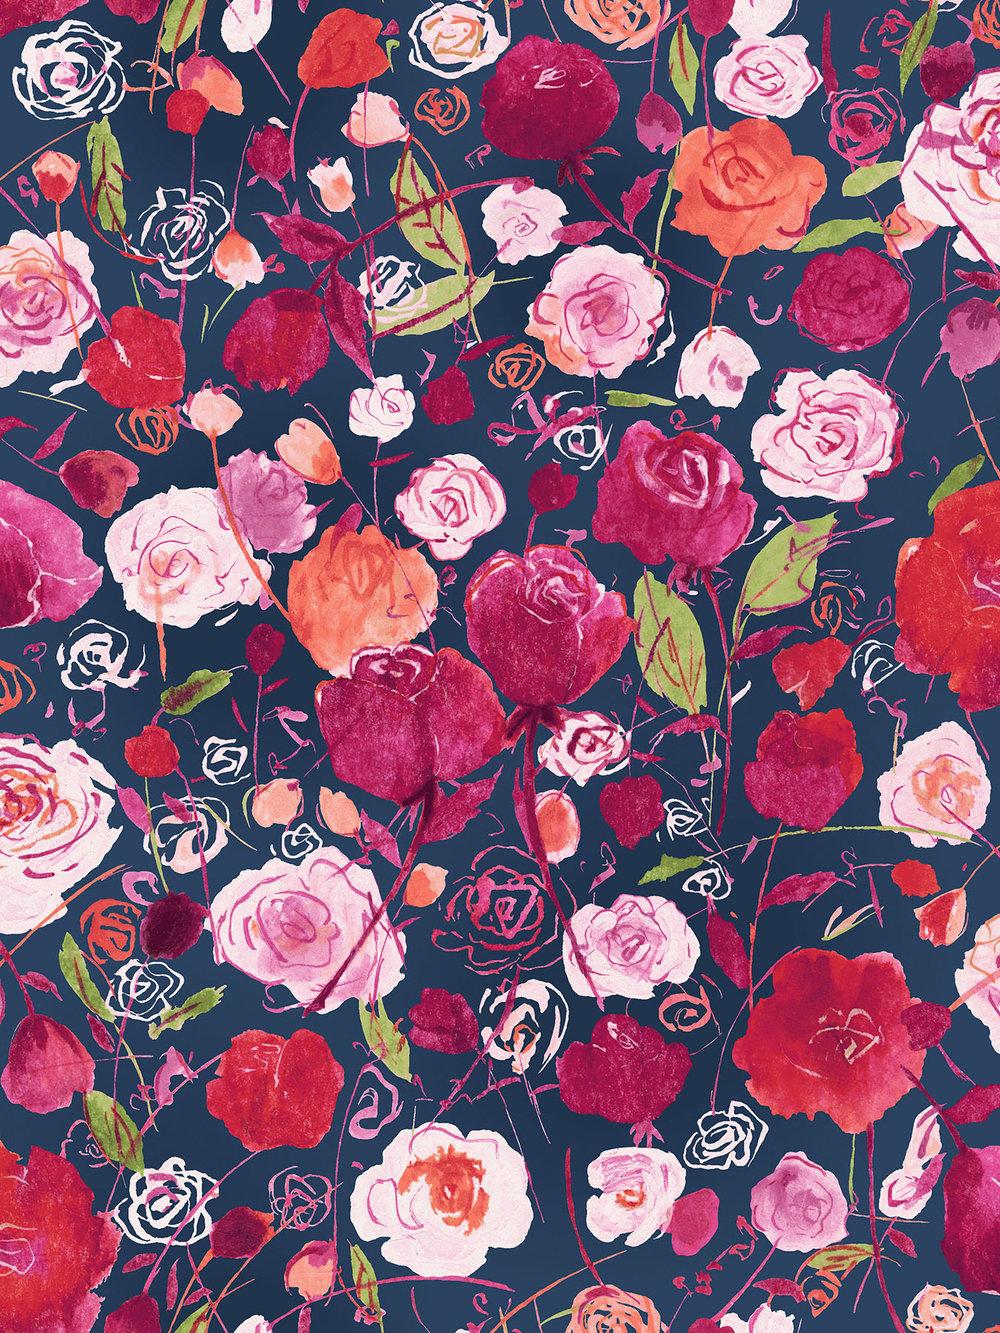 3515-001 ROSE GARDEN-PEONY